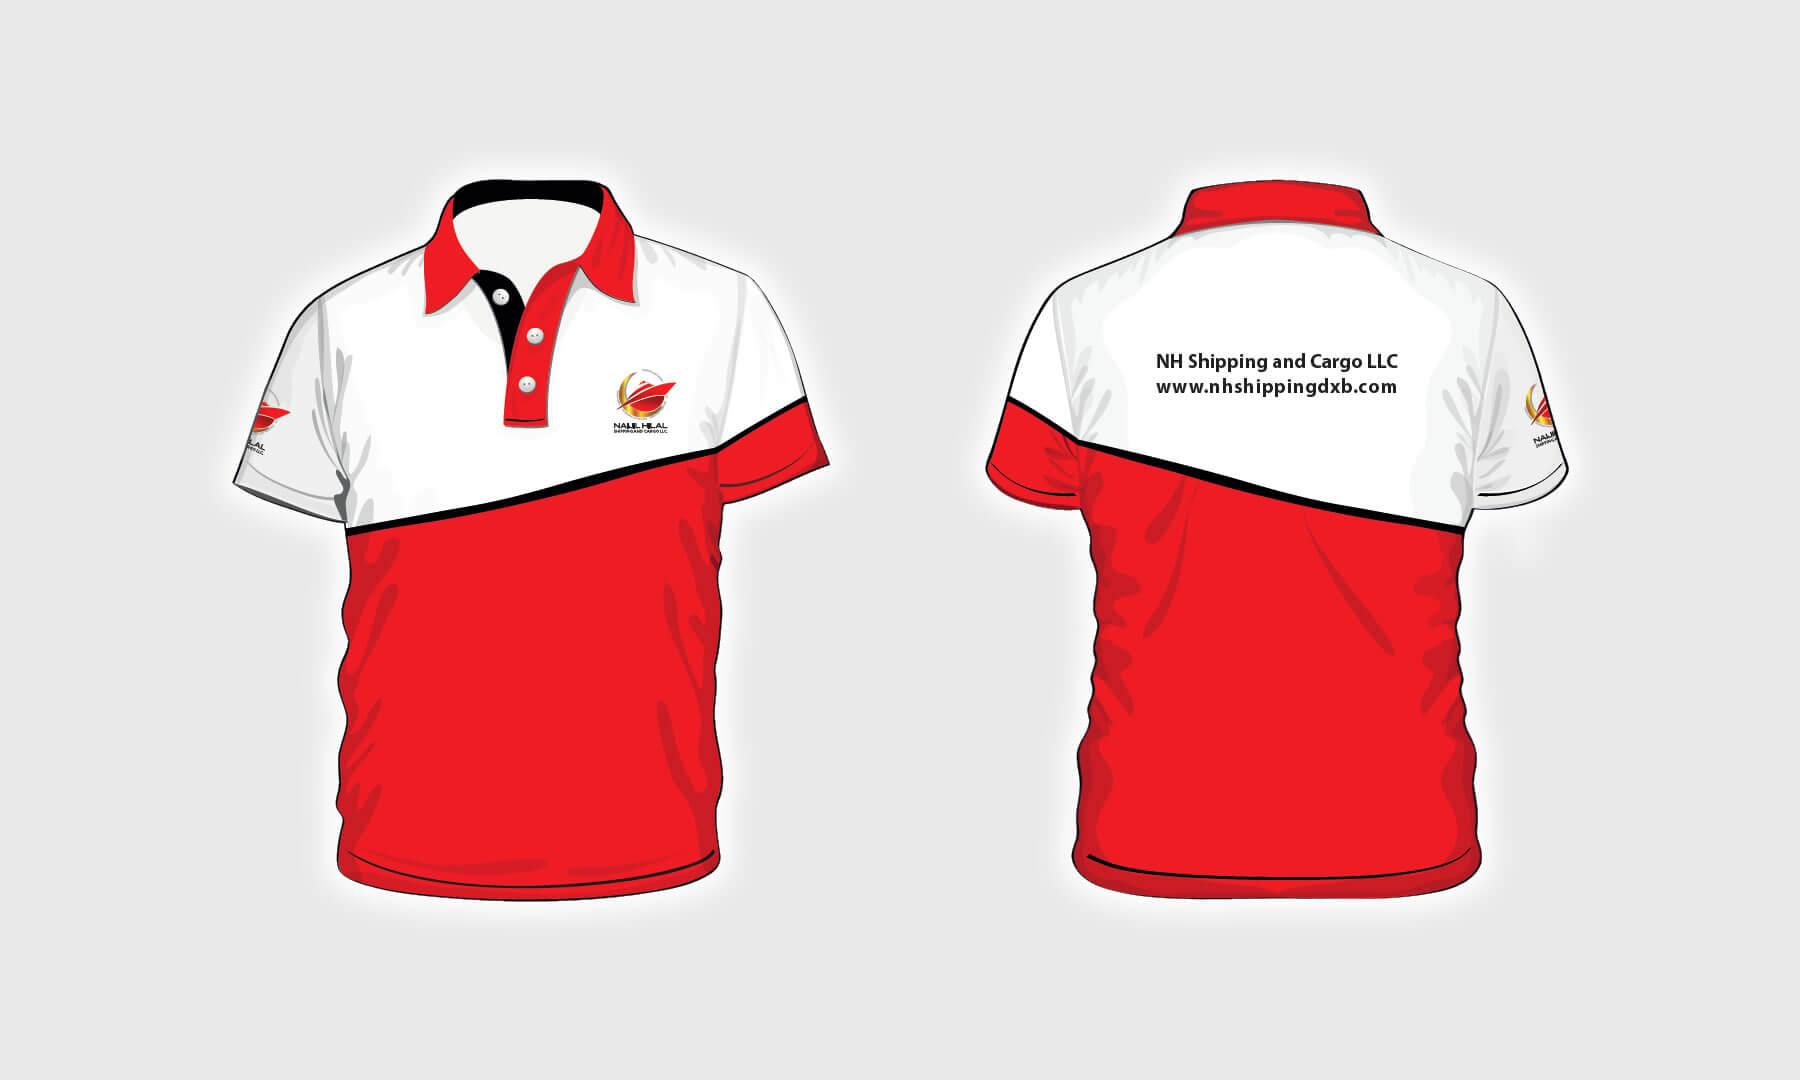 T-shirt design by Kerala freelance designer